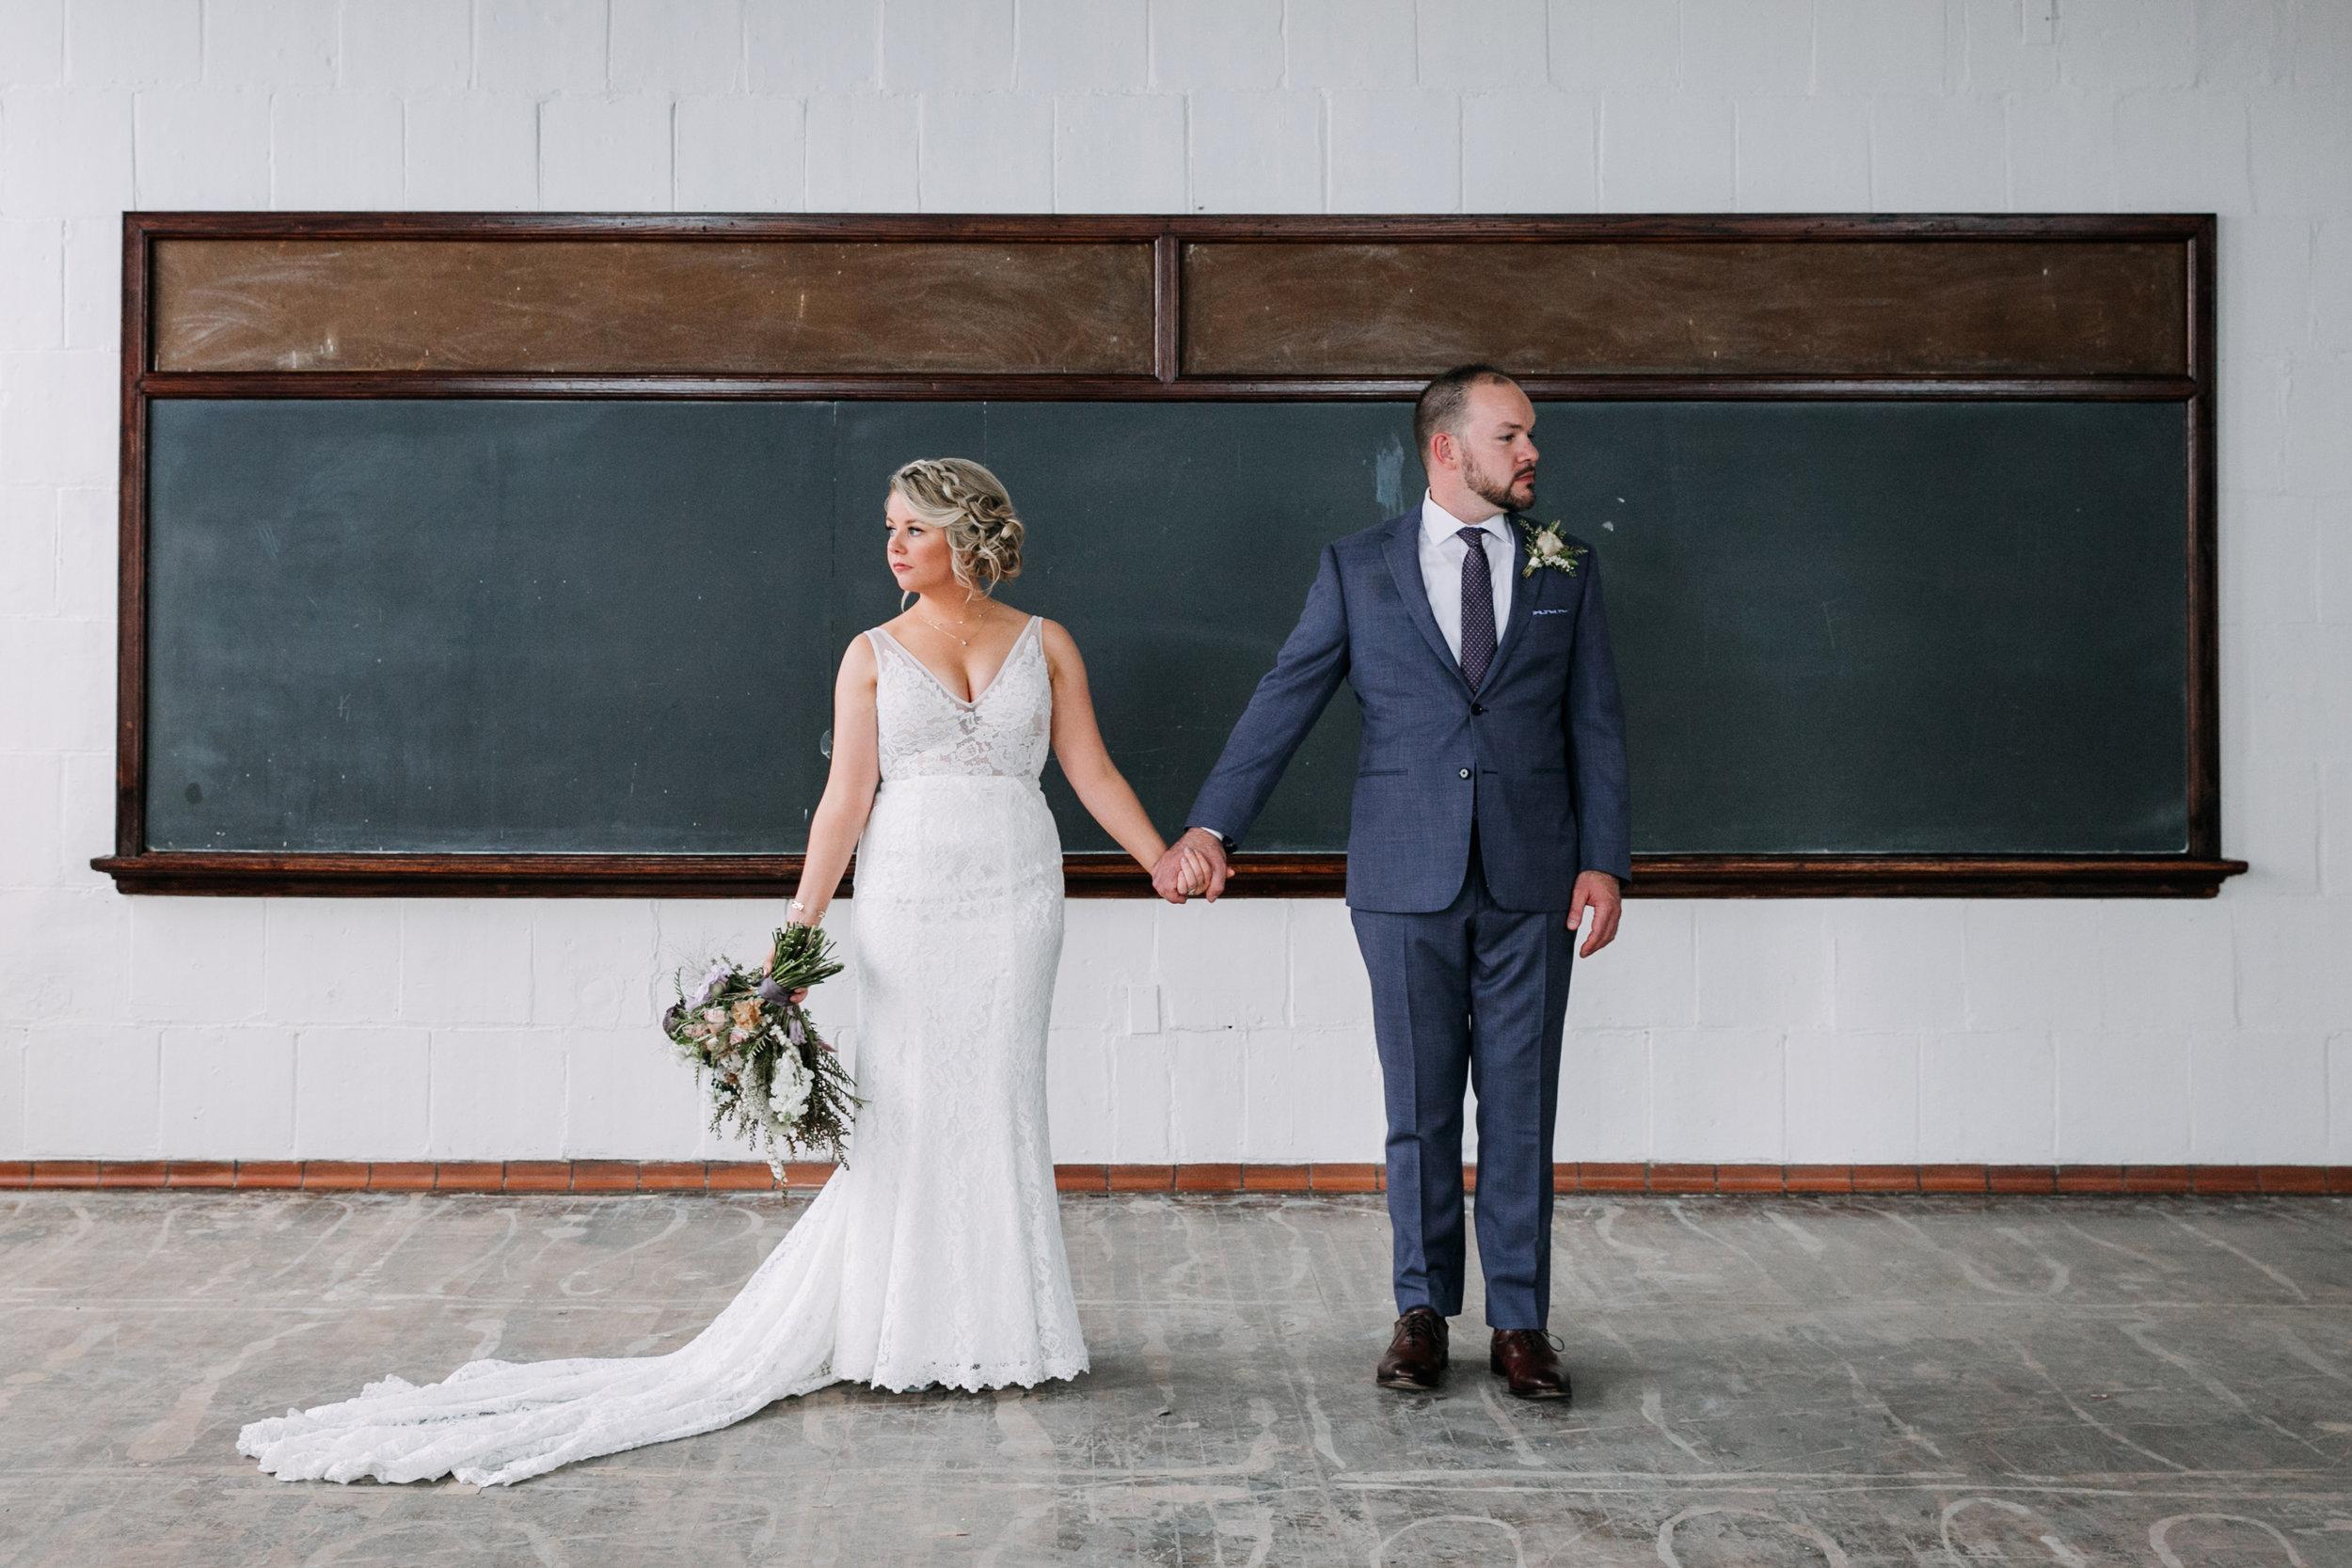 KAYLEEN + ANTHONY - BOKPhotographer: Love Me Do